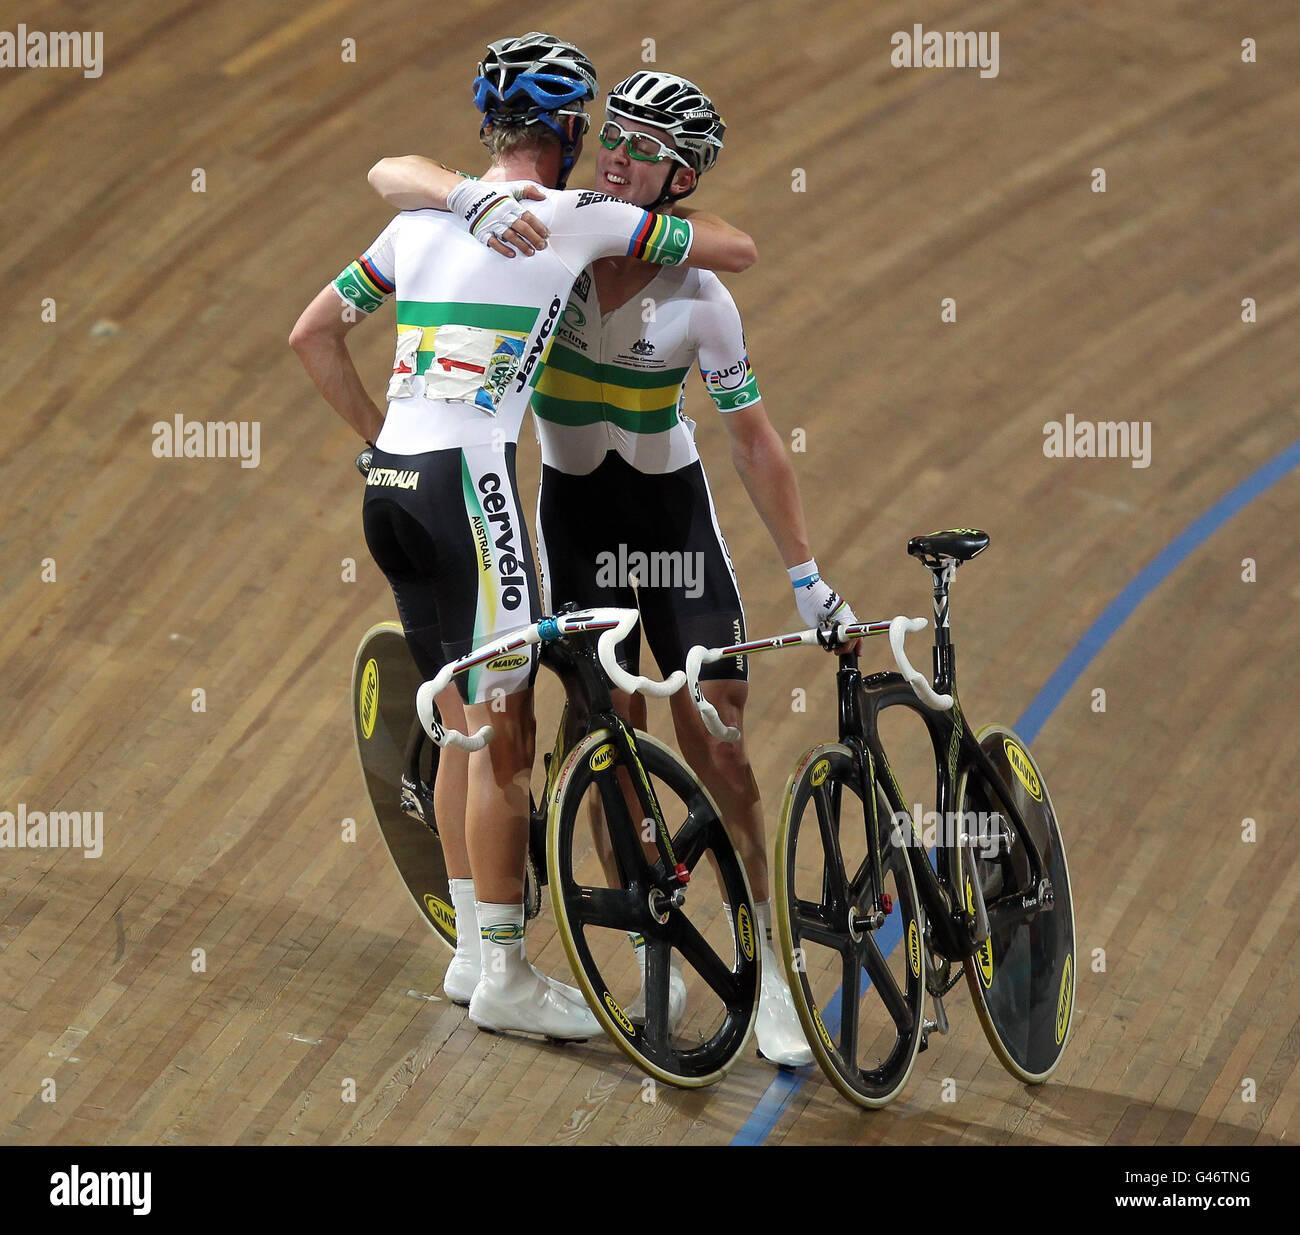 Cycling - 2011 UCI Track Cycling World Championships - Day